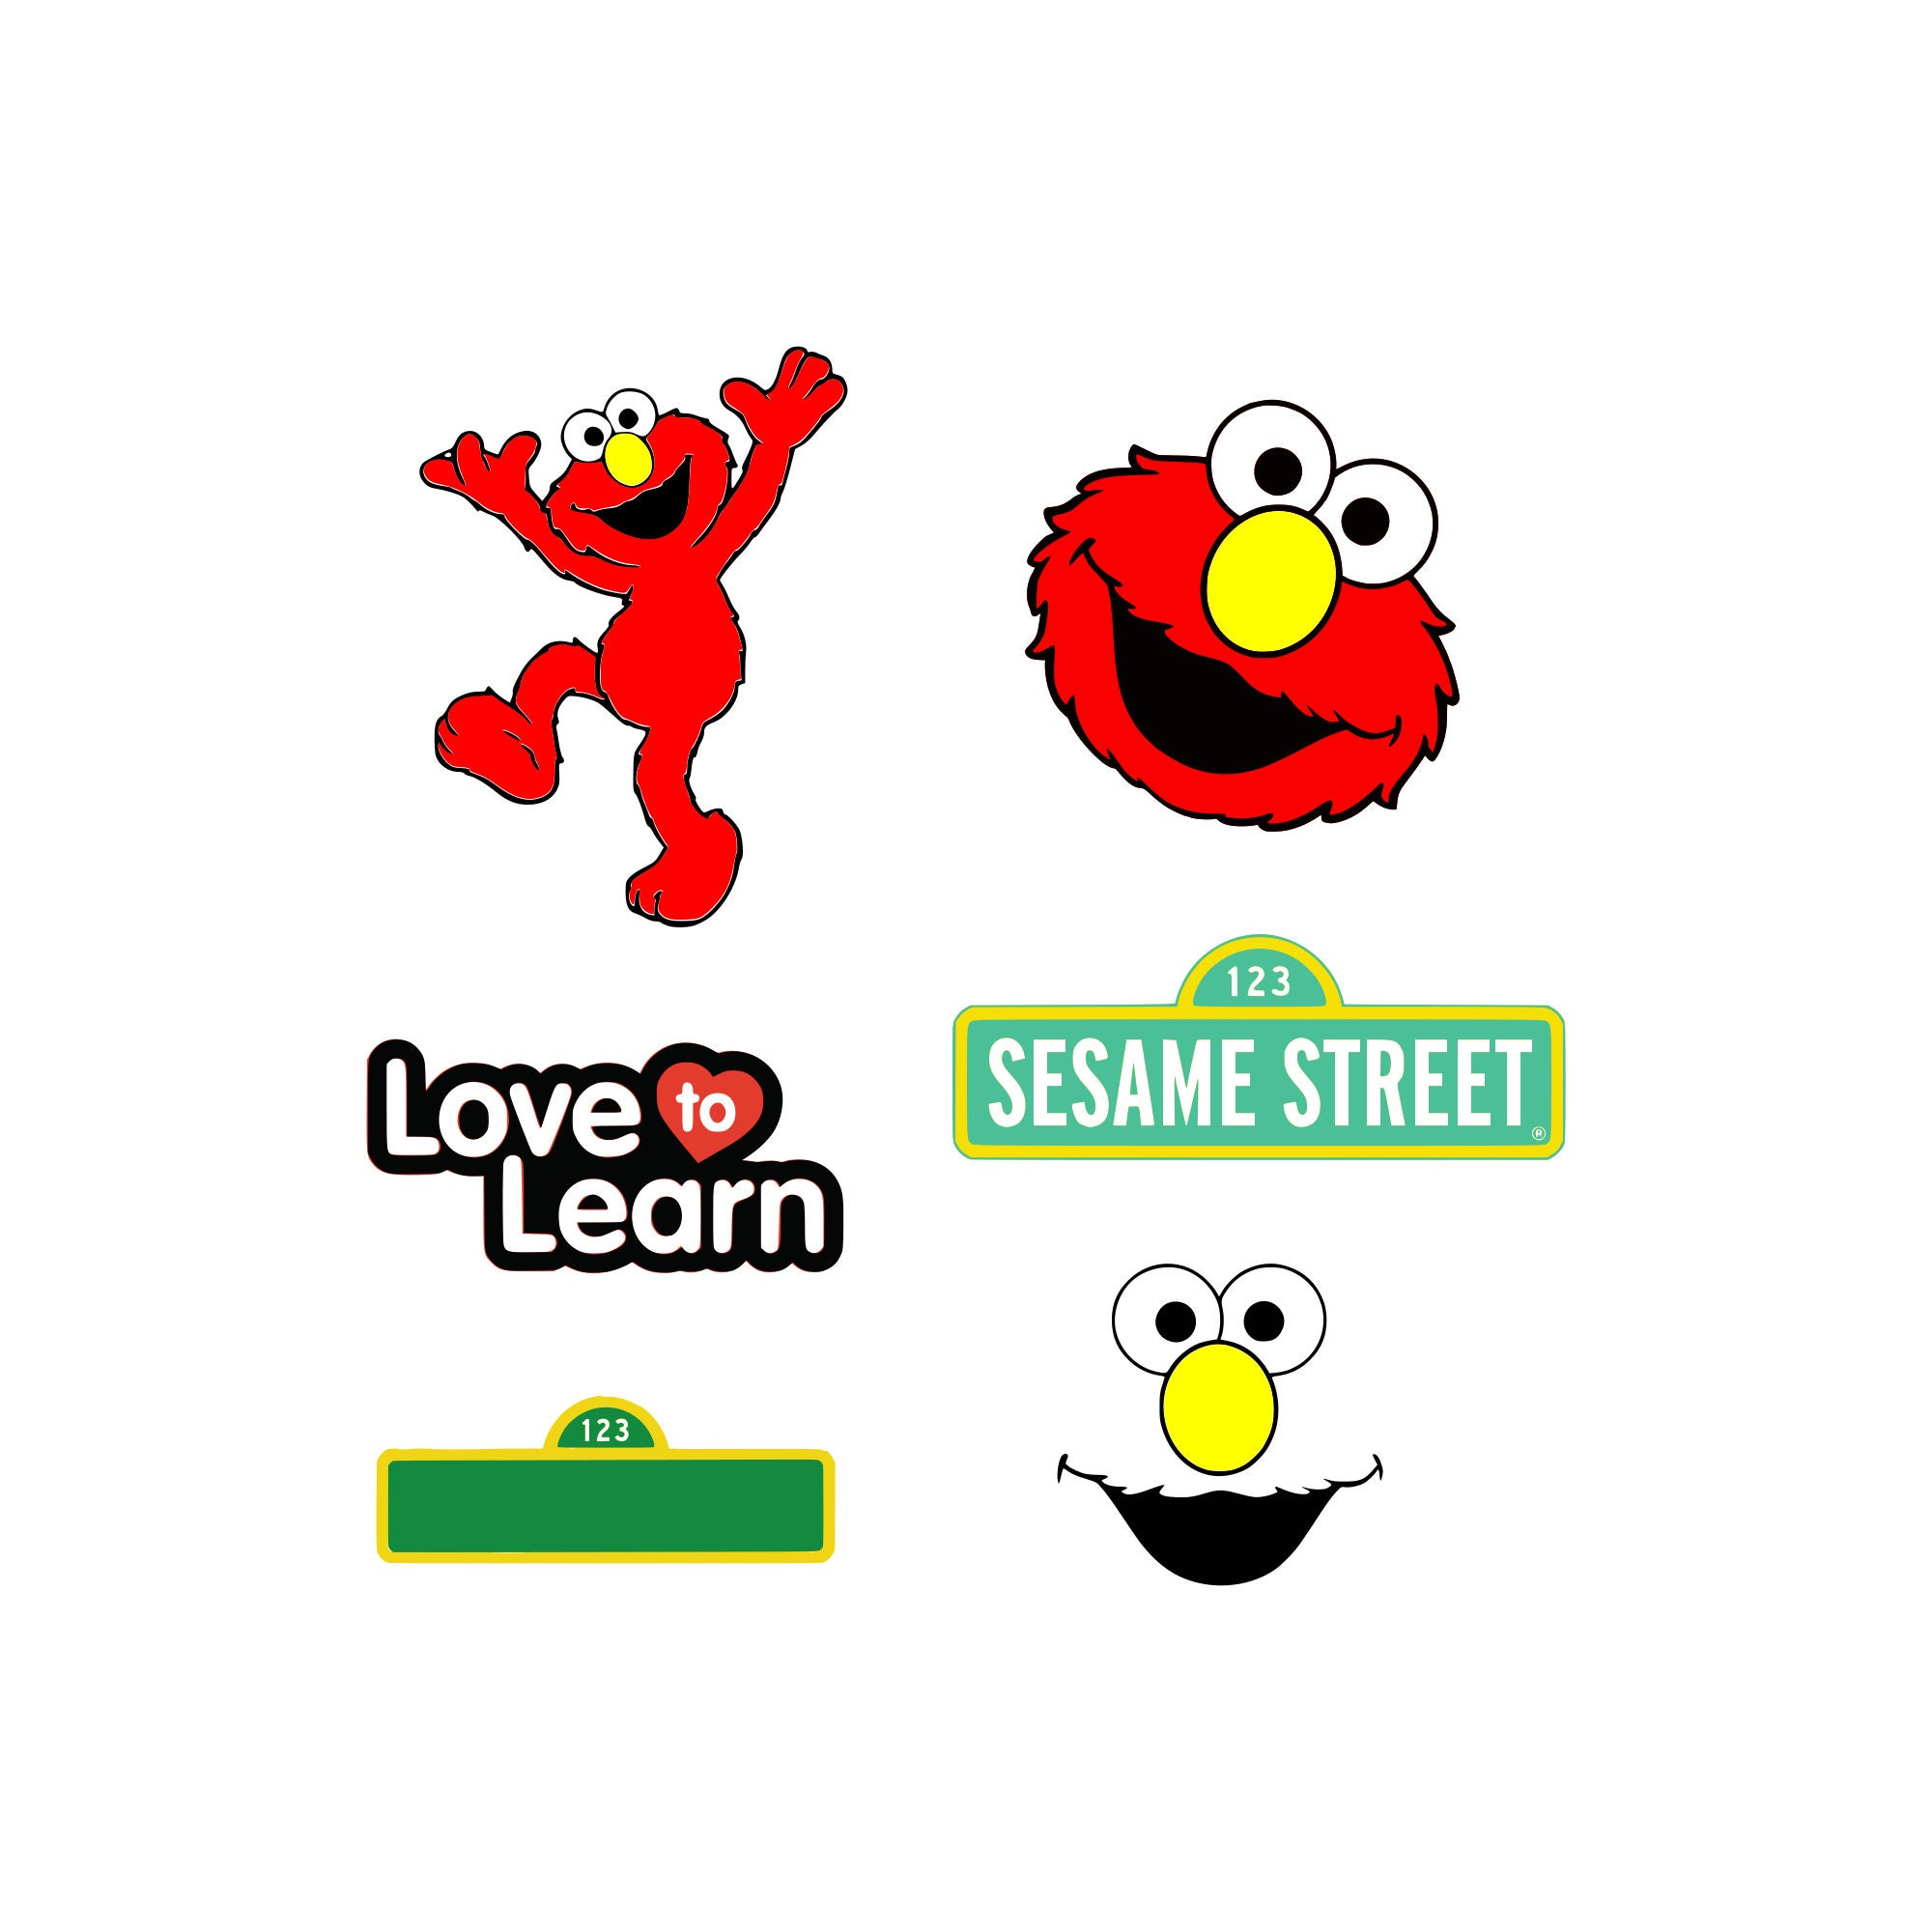 Sesame street svg Elmo svg Sesame stree Sign and Blank Sign | Etsy